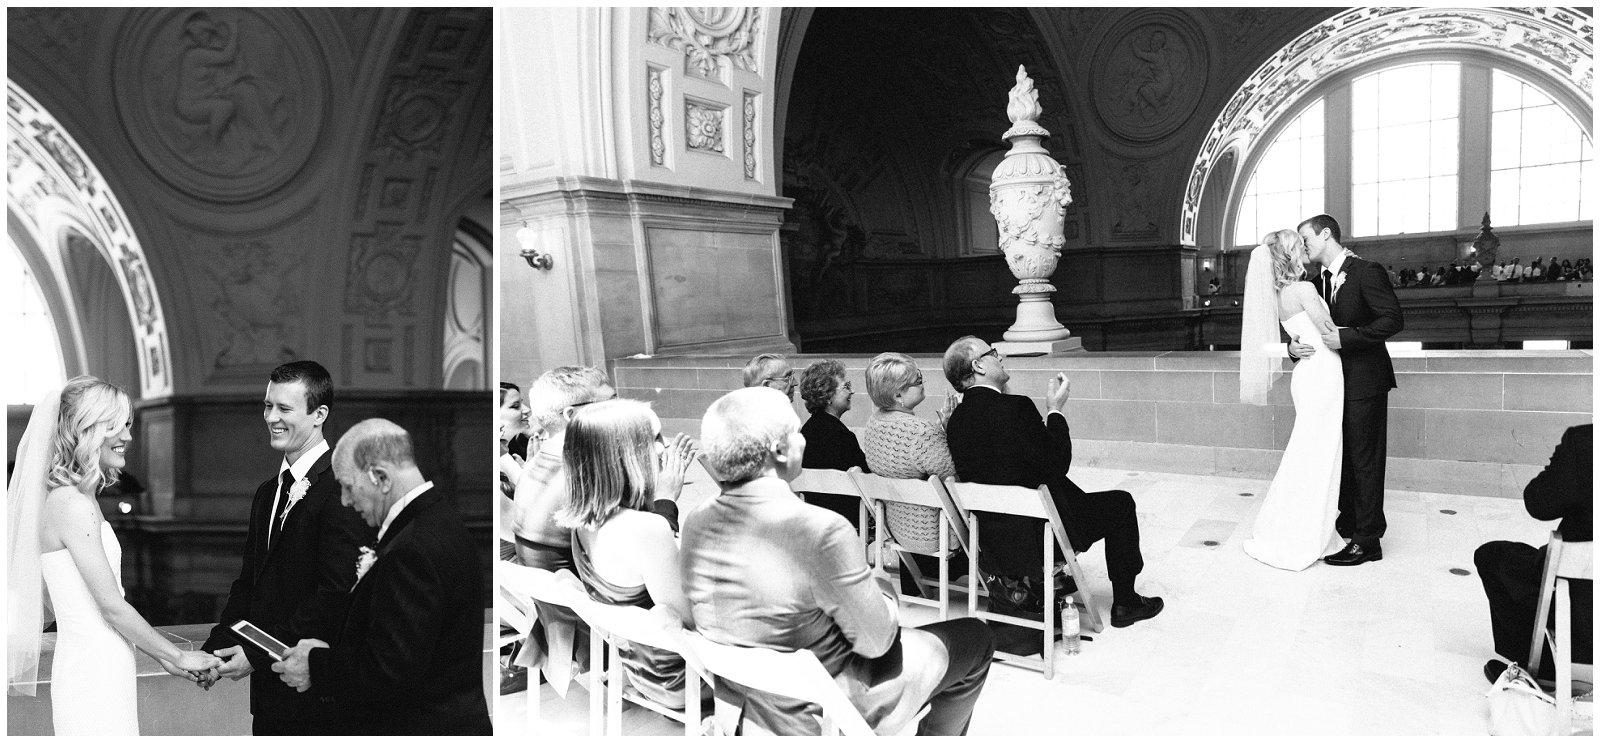 San-Francisco-Bay-Area-Wedding-Photography-City-Hall-7.jpg